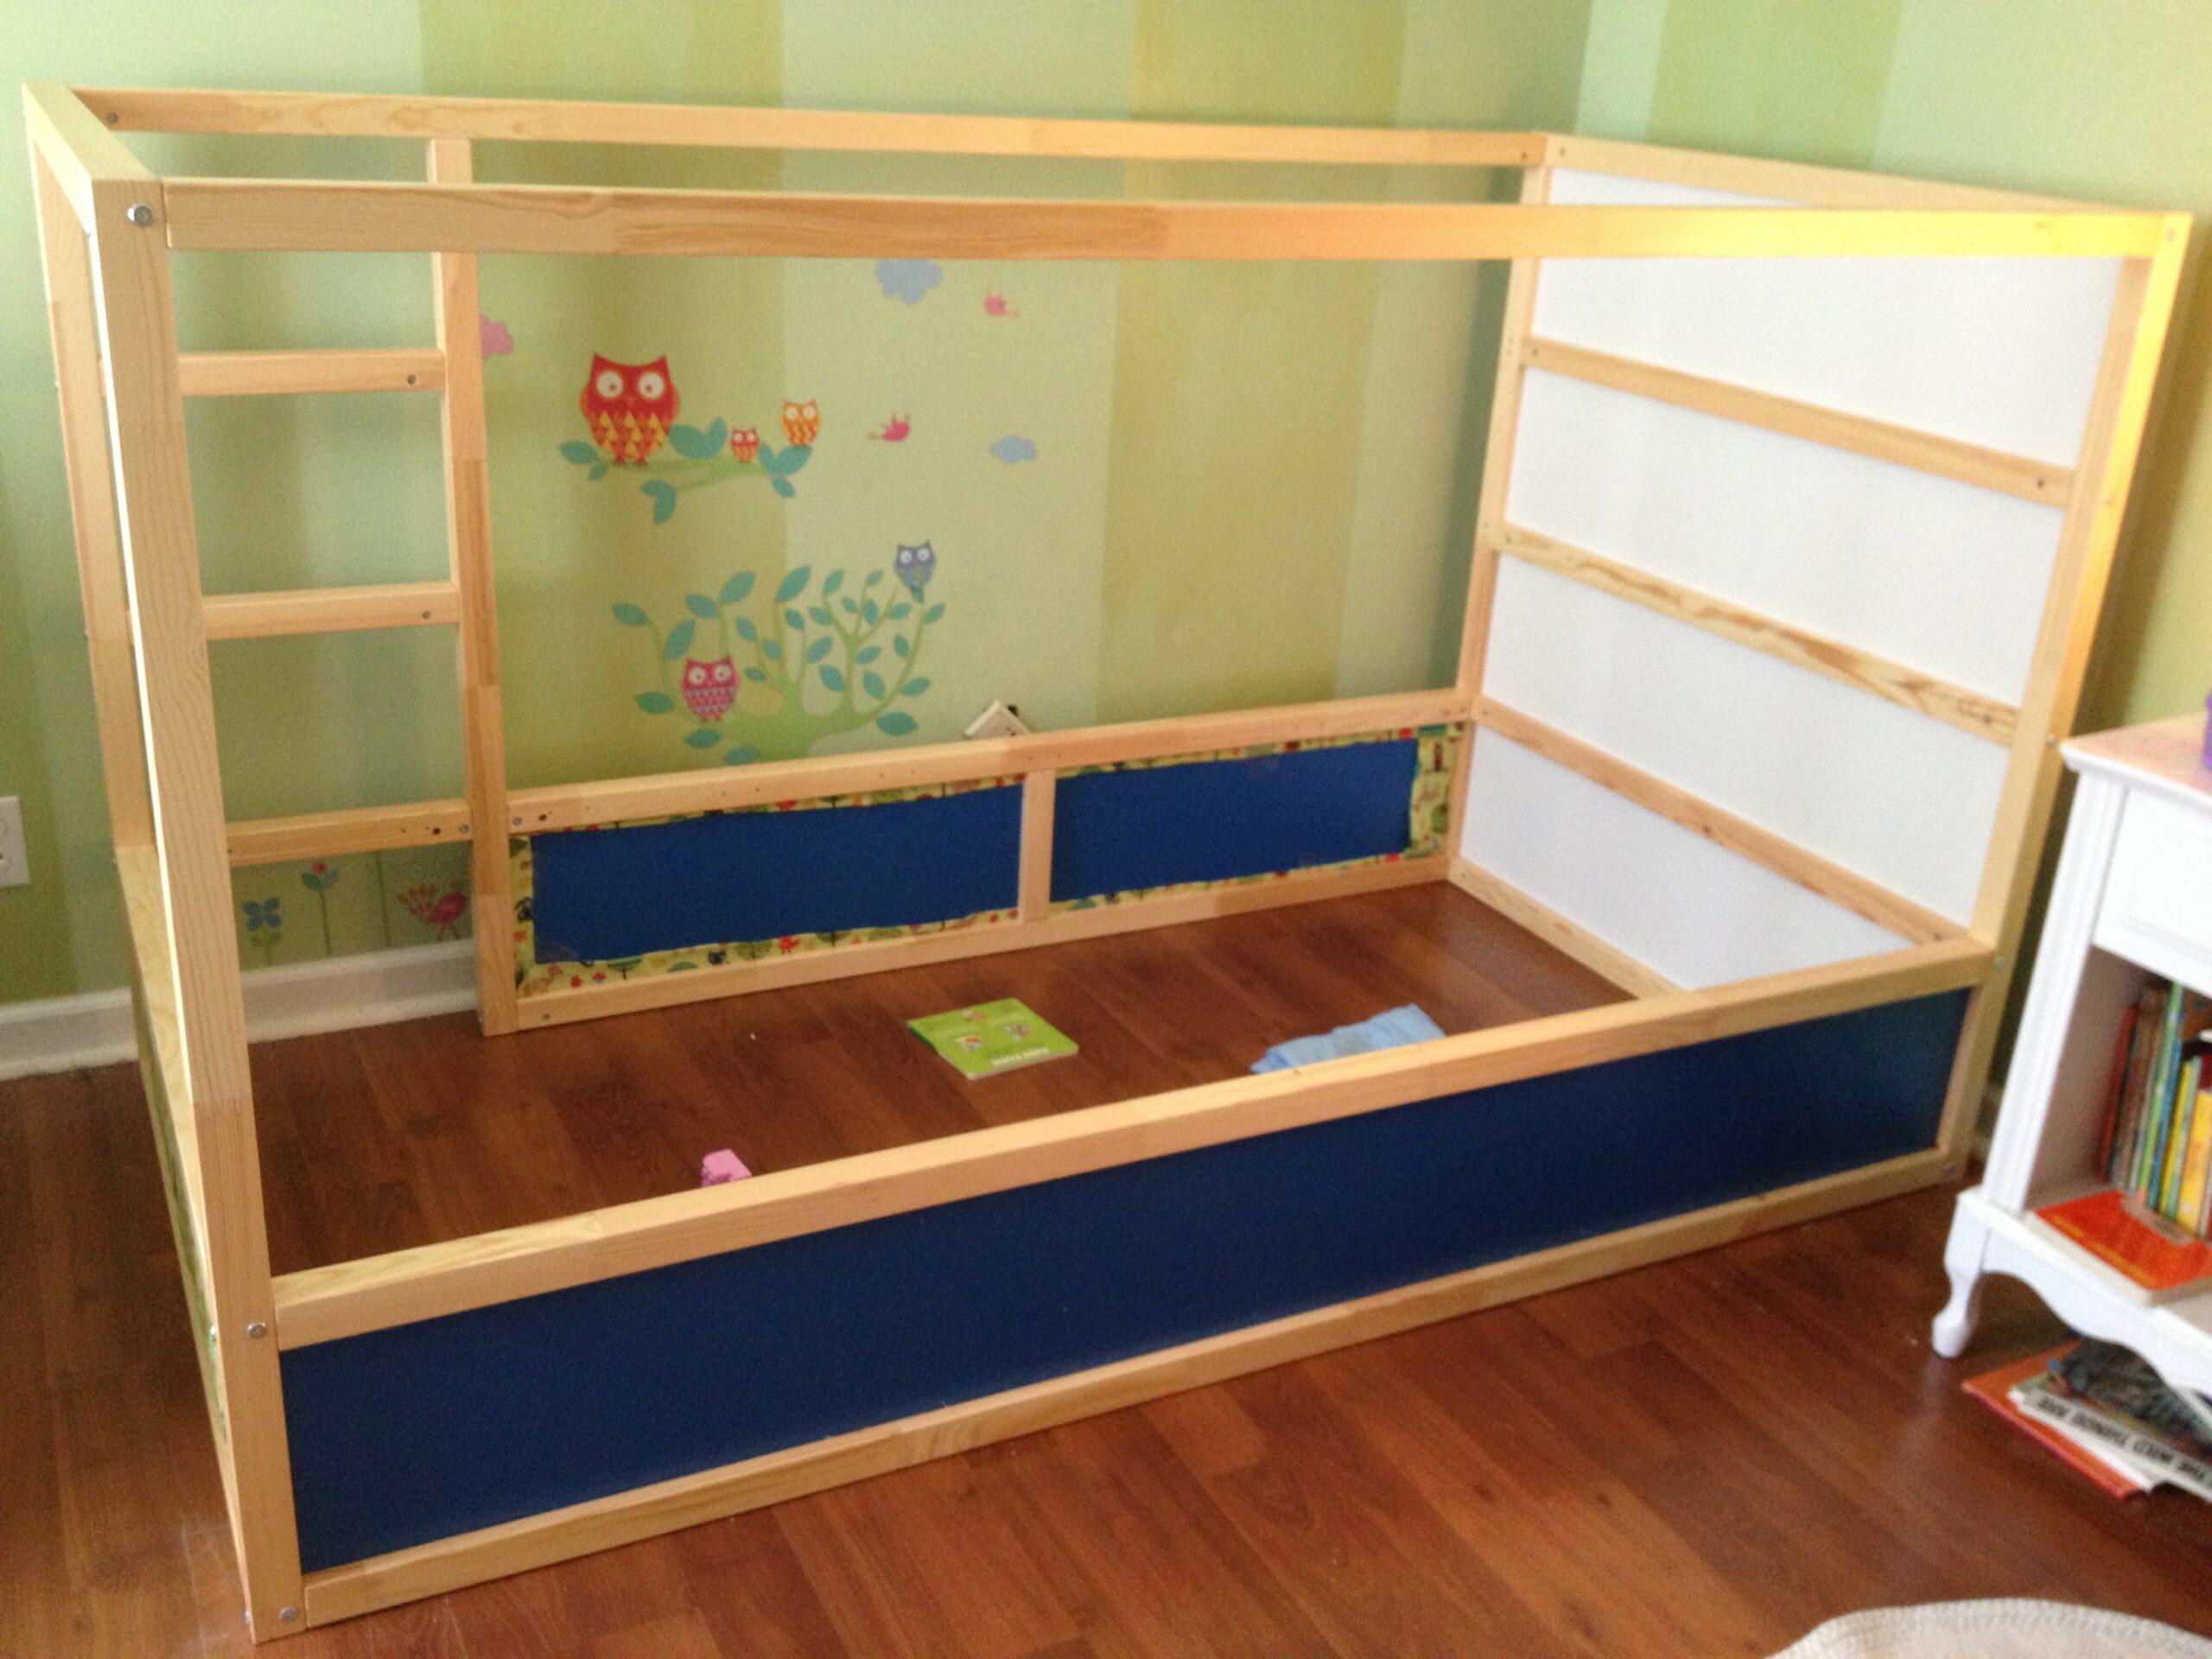 Full Size of Kura Bunk Bed Hack Storage Ikea House Hacks Pinterest Montessori Double Ideas 18 25 Best About Tent On Wohnzimmer Kura Hack